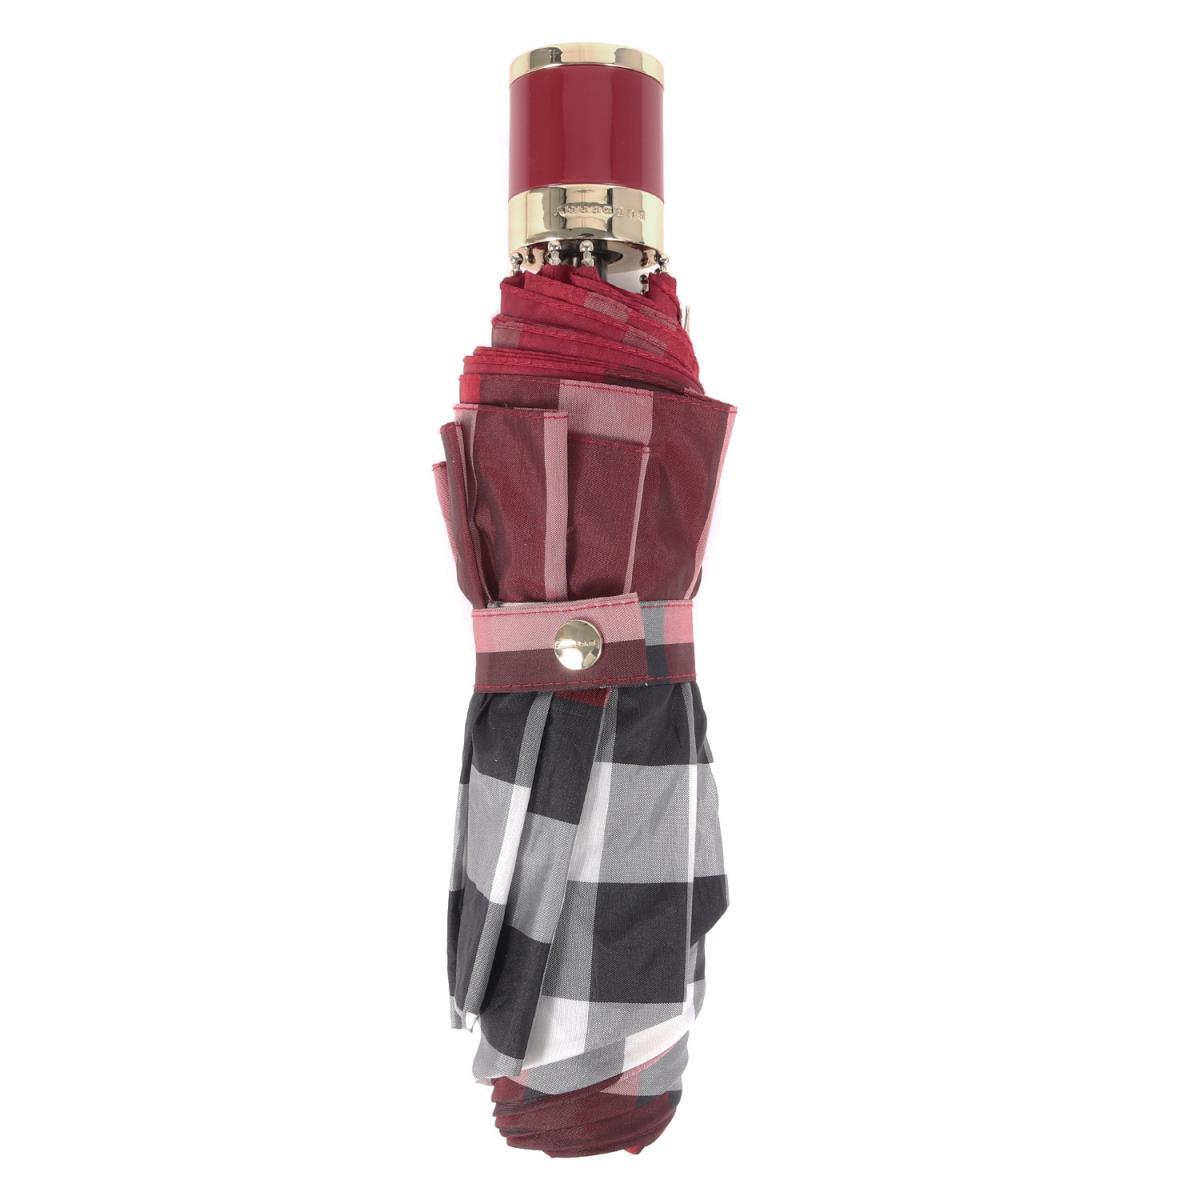 BURBERRY バーバリー 傘 タータンチェック 折り畳み傘 パレードレッド 【メンズ】【中古】【美品】【K2550】